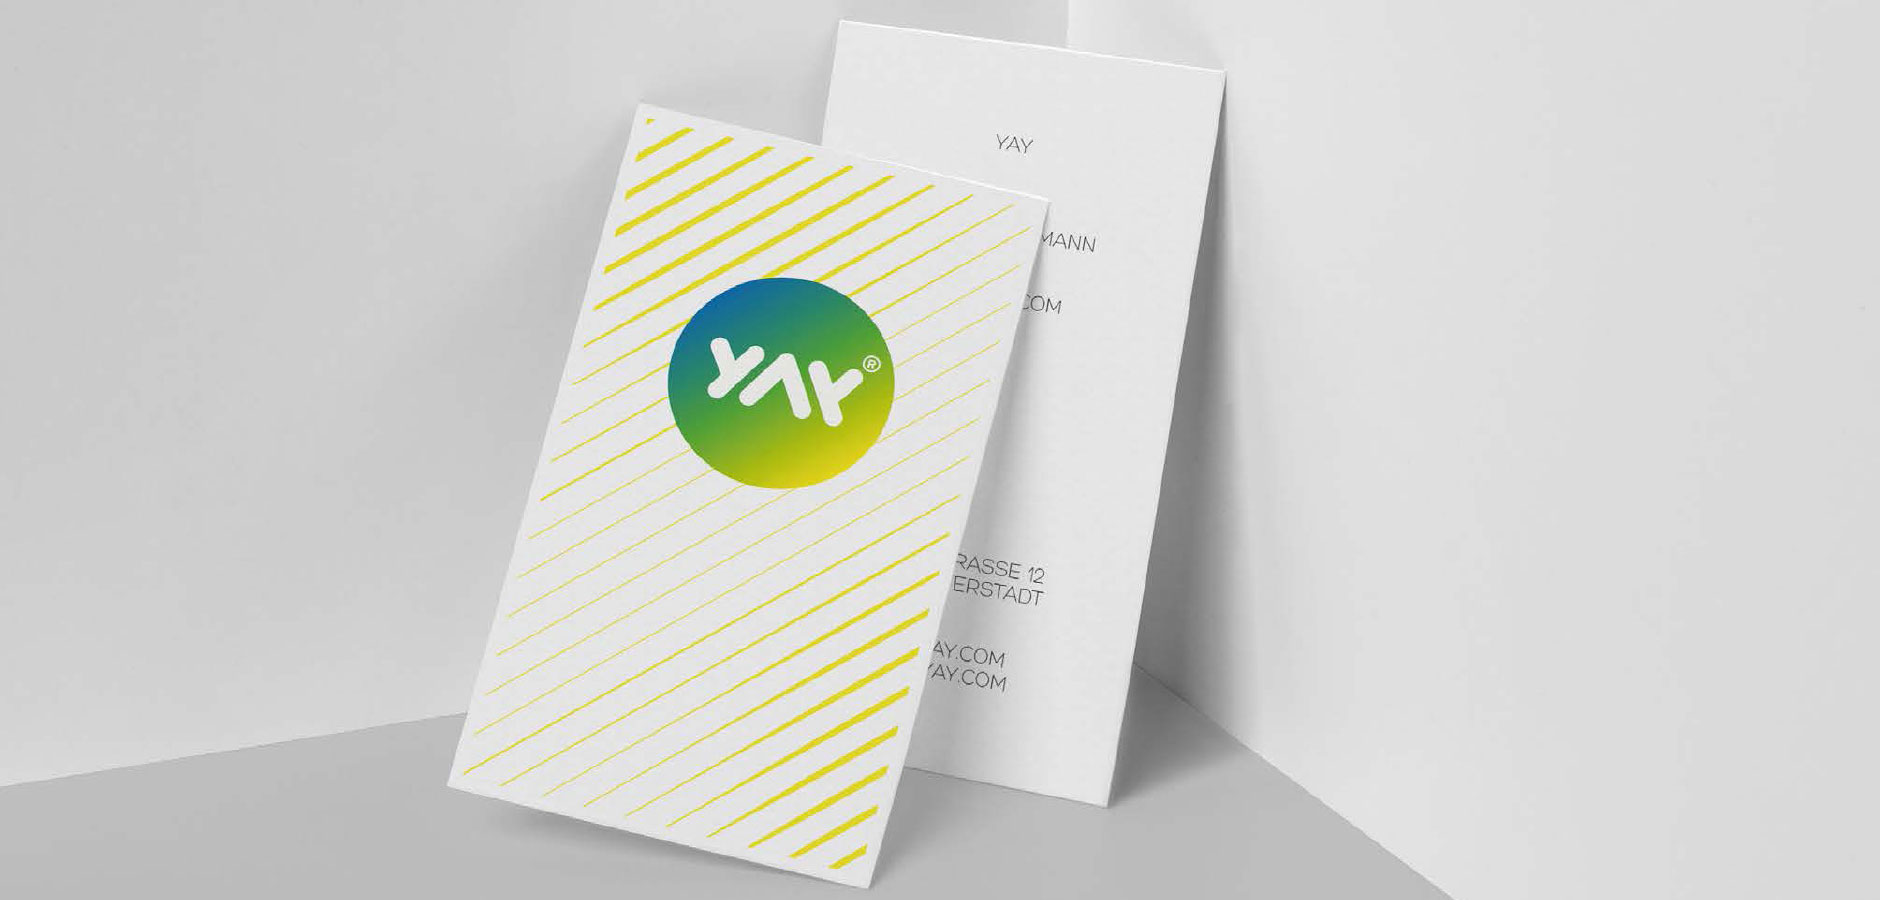 YAY Corporate Design